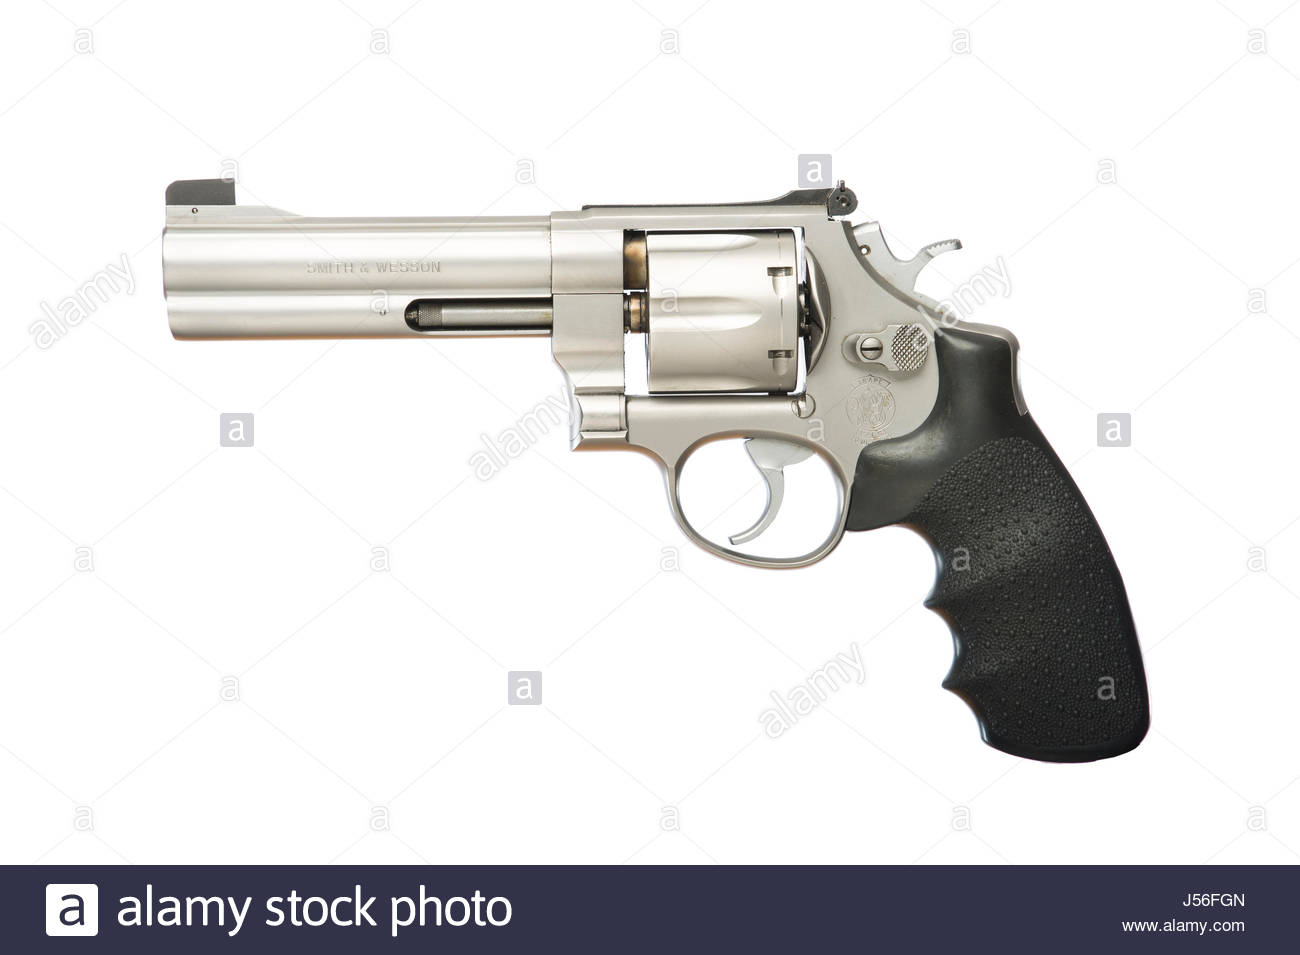 Smith & Wesson Model 625, N frame, 5 inch barrel revolver pistol ...